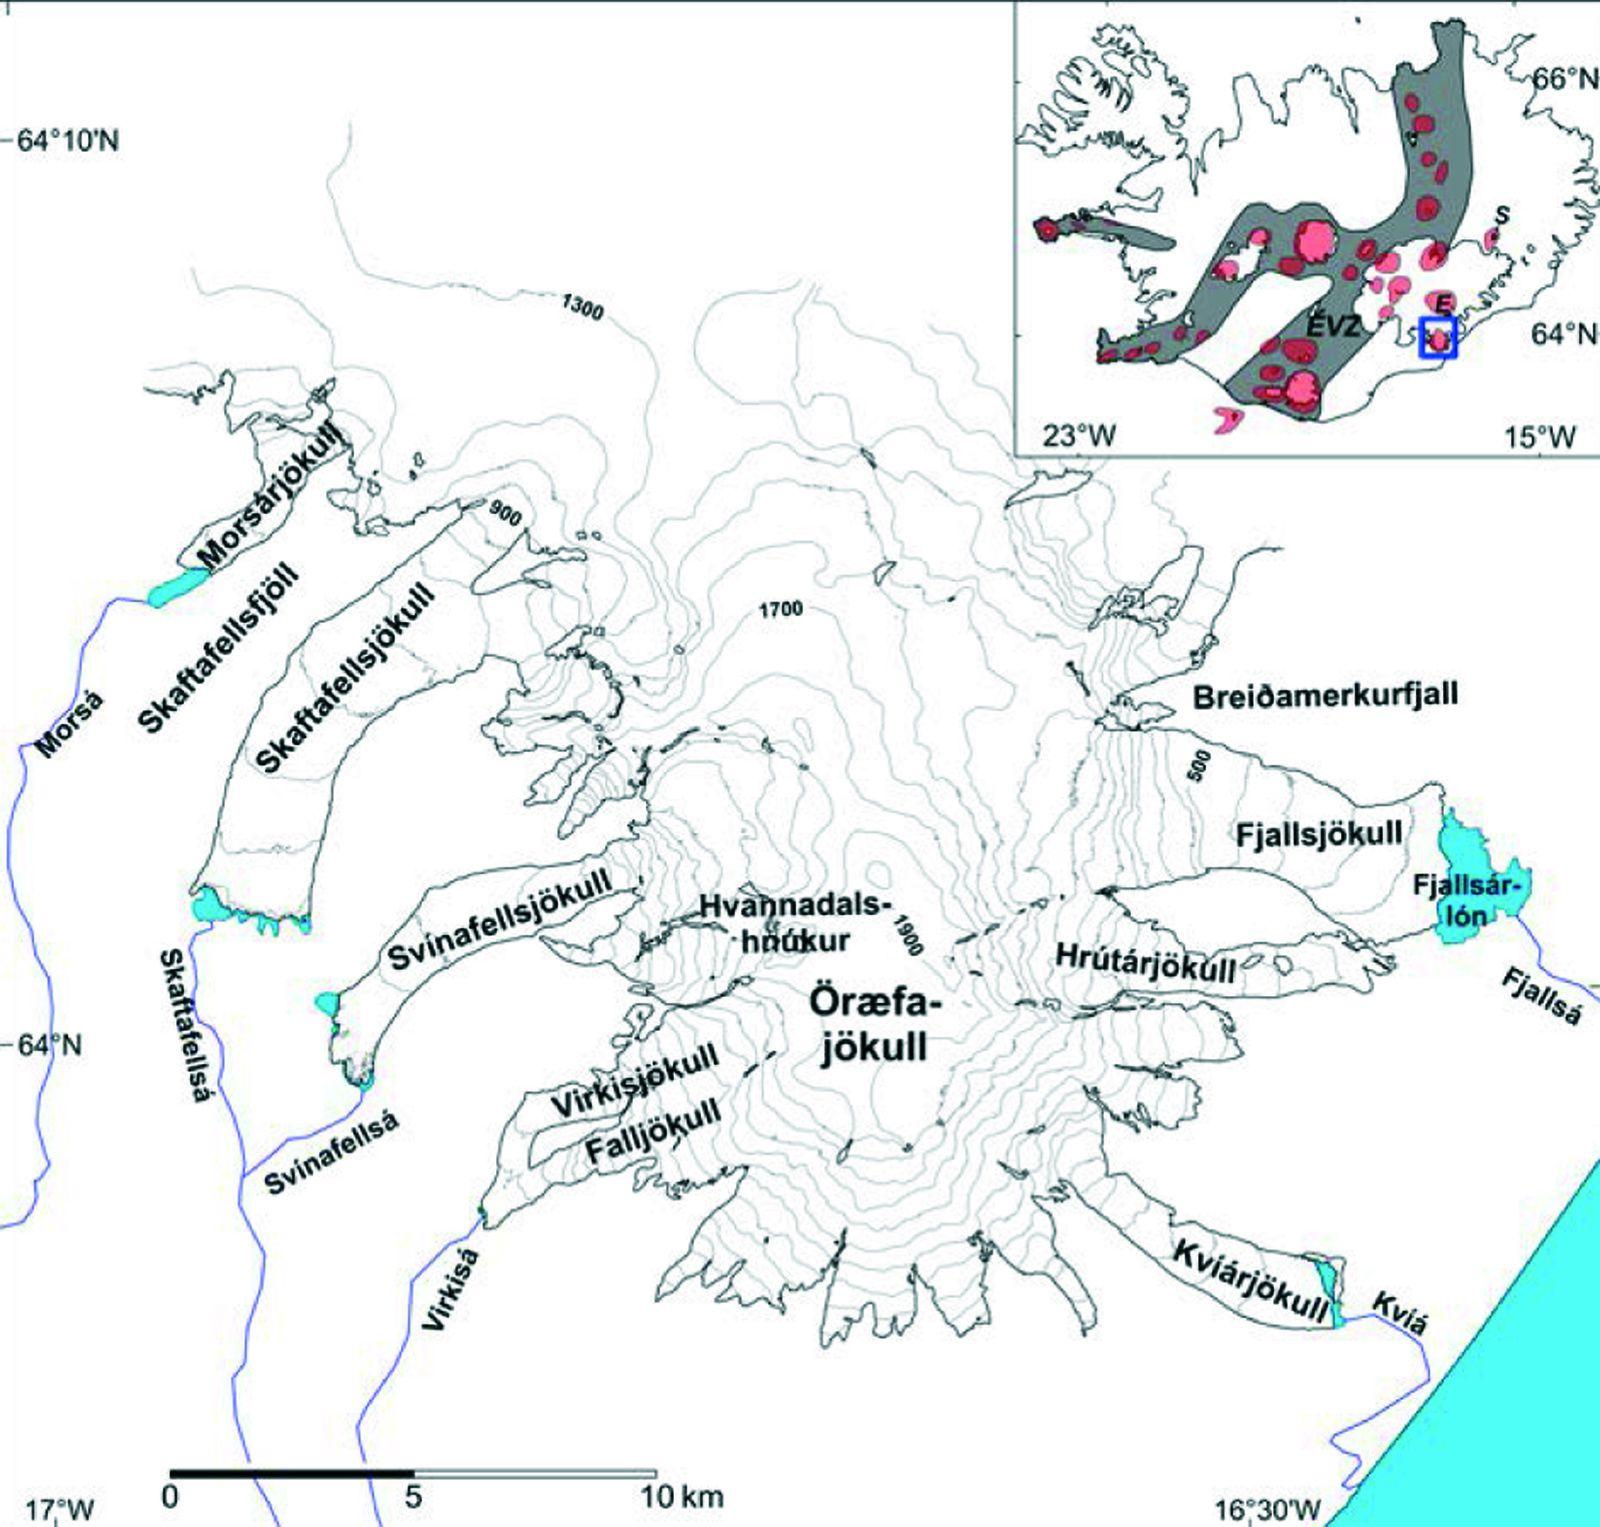 La couverture glaciaire et les glaciers exutoires de l'Öraefajökull - doc. Removing the ice cap of Öræfajökull central volcano, SE-Iceland: Mapping and interpretation of bedrock topography, ice volumes, subglacial troughs and implications for hazards assessments Eyjólfur Magnússon, Finnur Pálsson , Helgi Björnsson and Snævarr Guðmundsson  - 2014